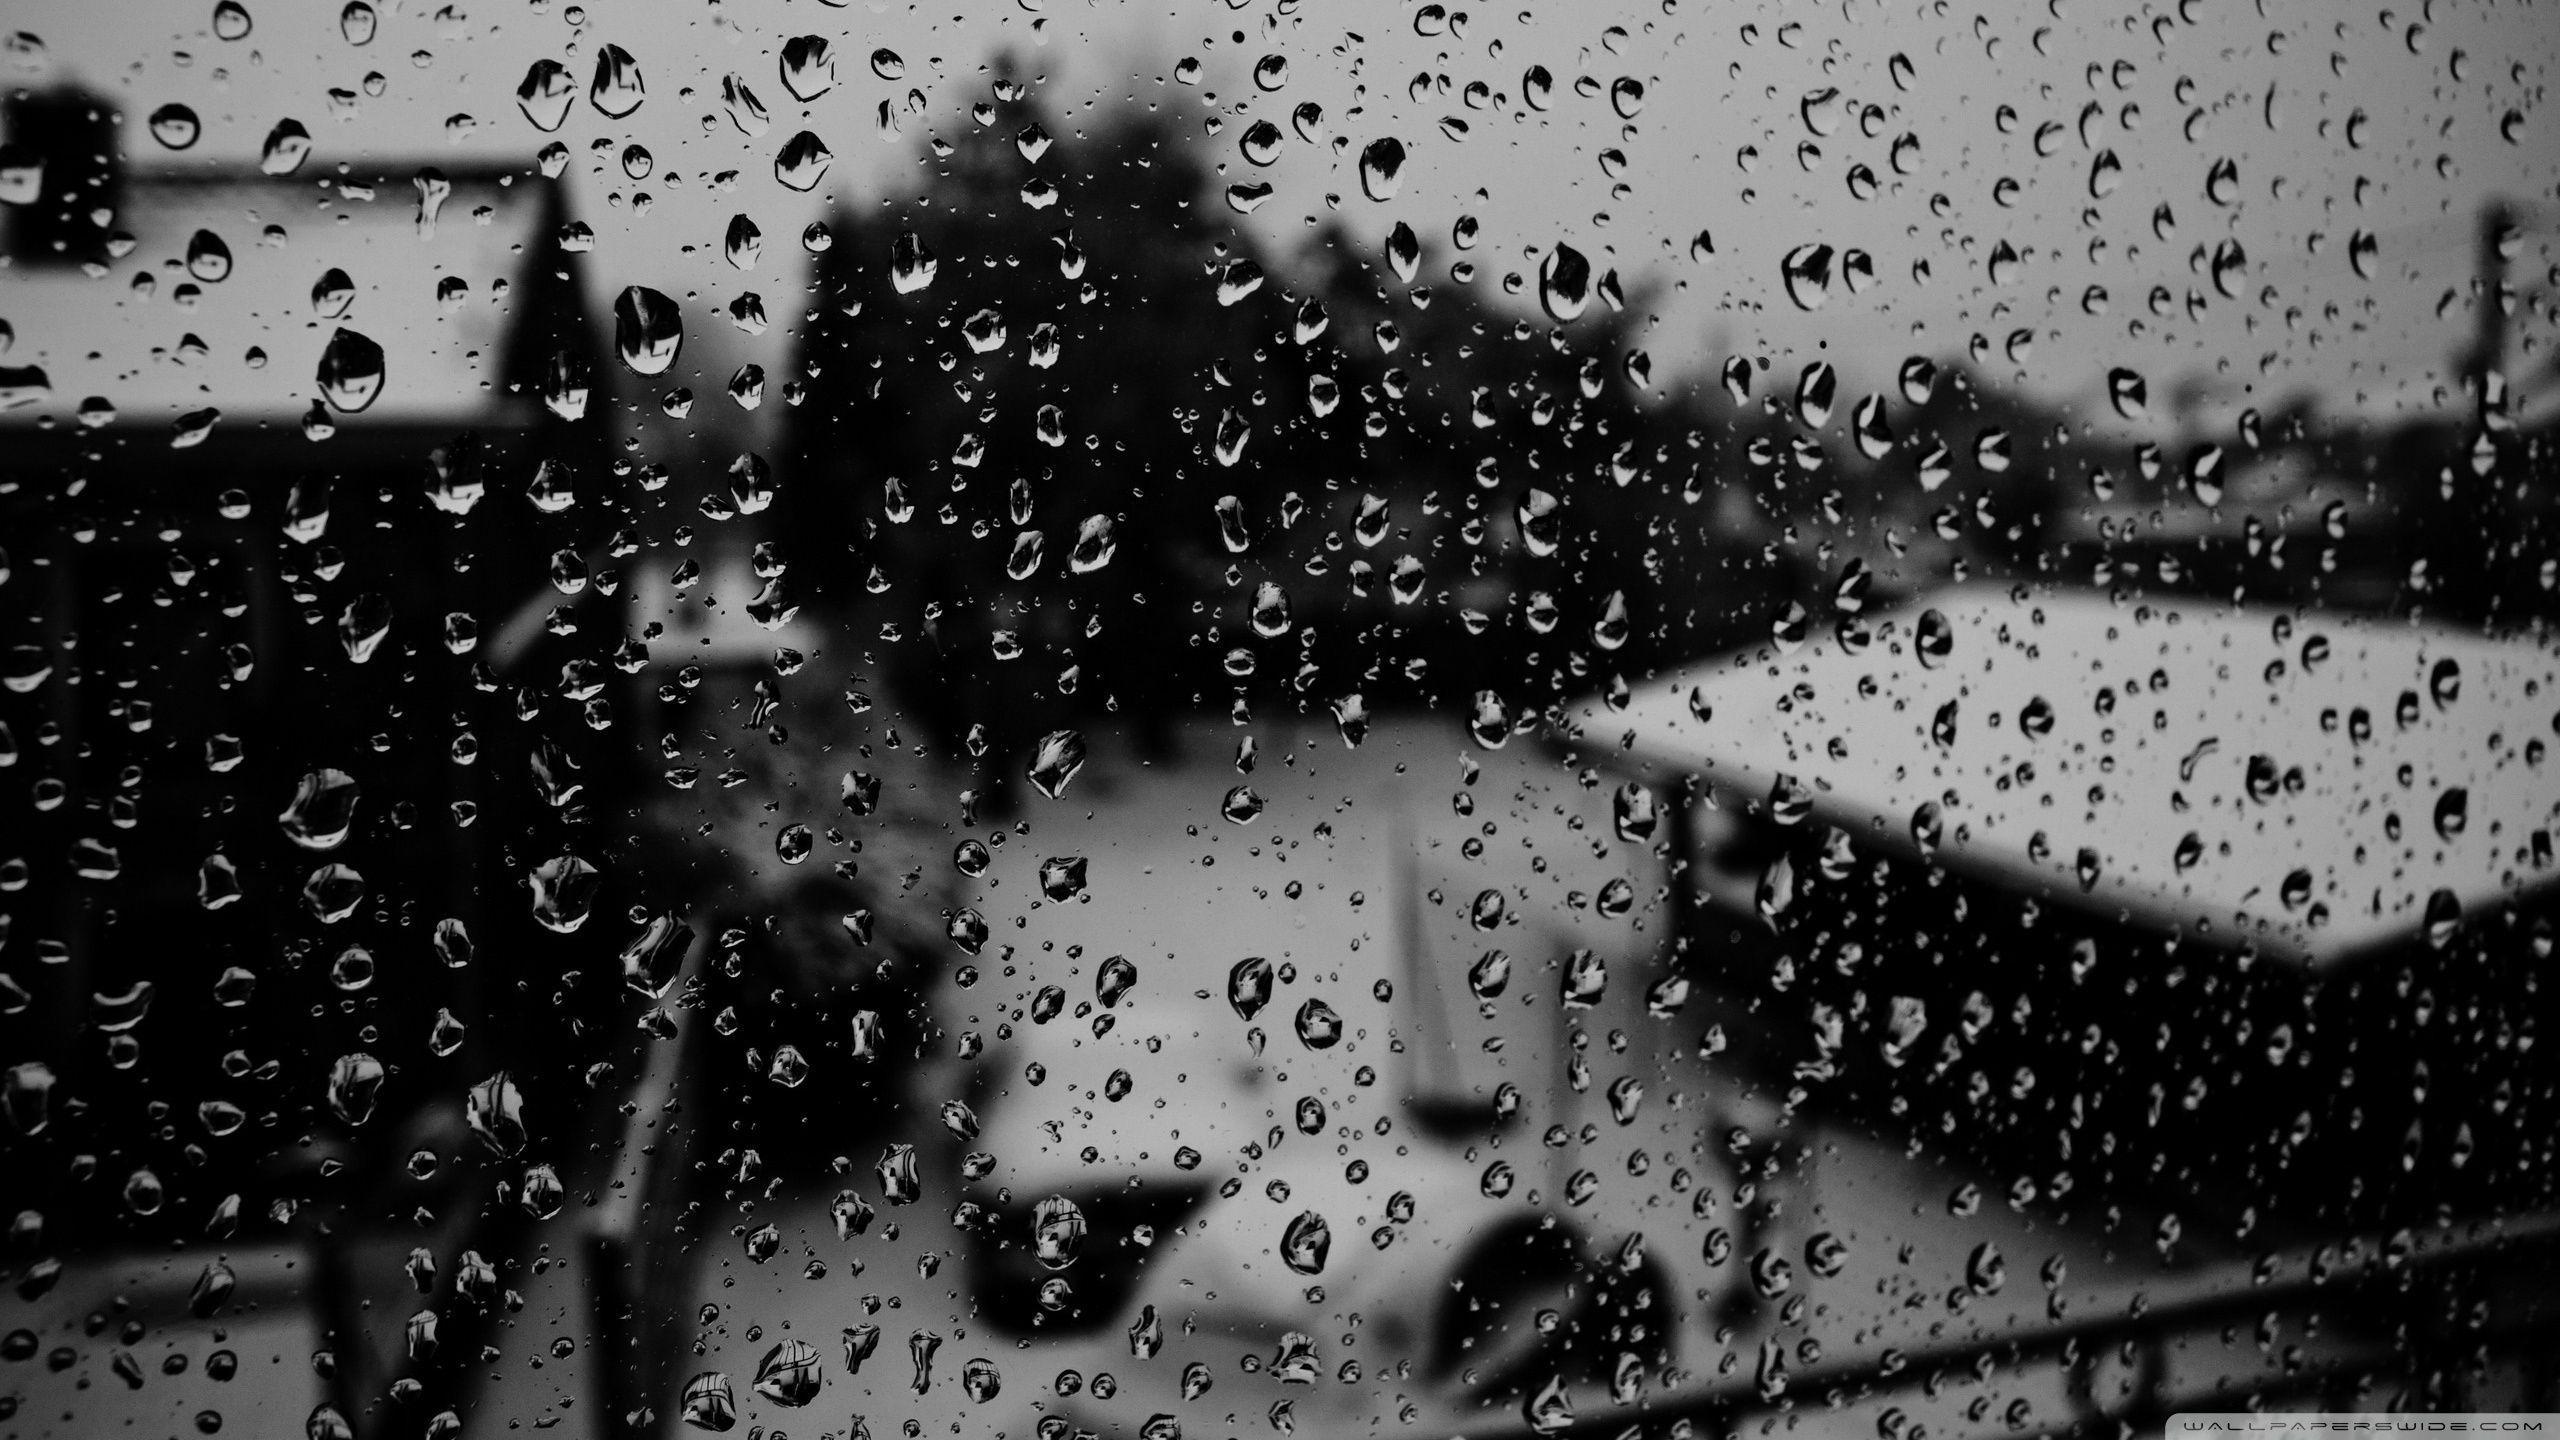 Winter Rain Wallpapers Top Free Winter Rain Backgrounds Wallpaperaccess